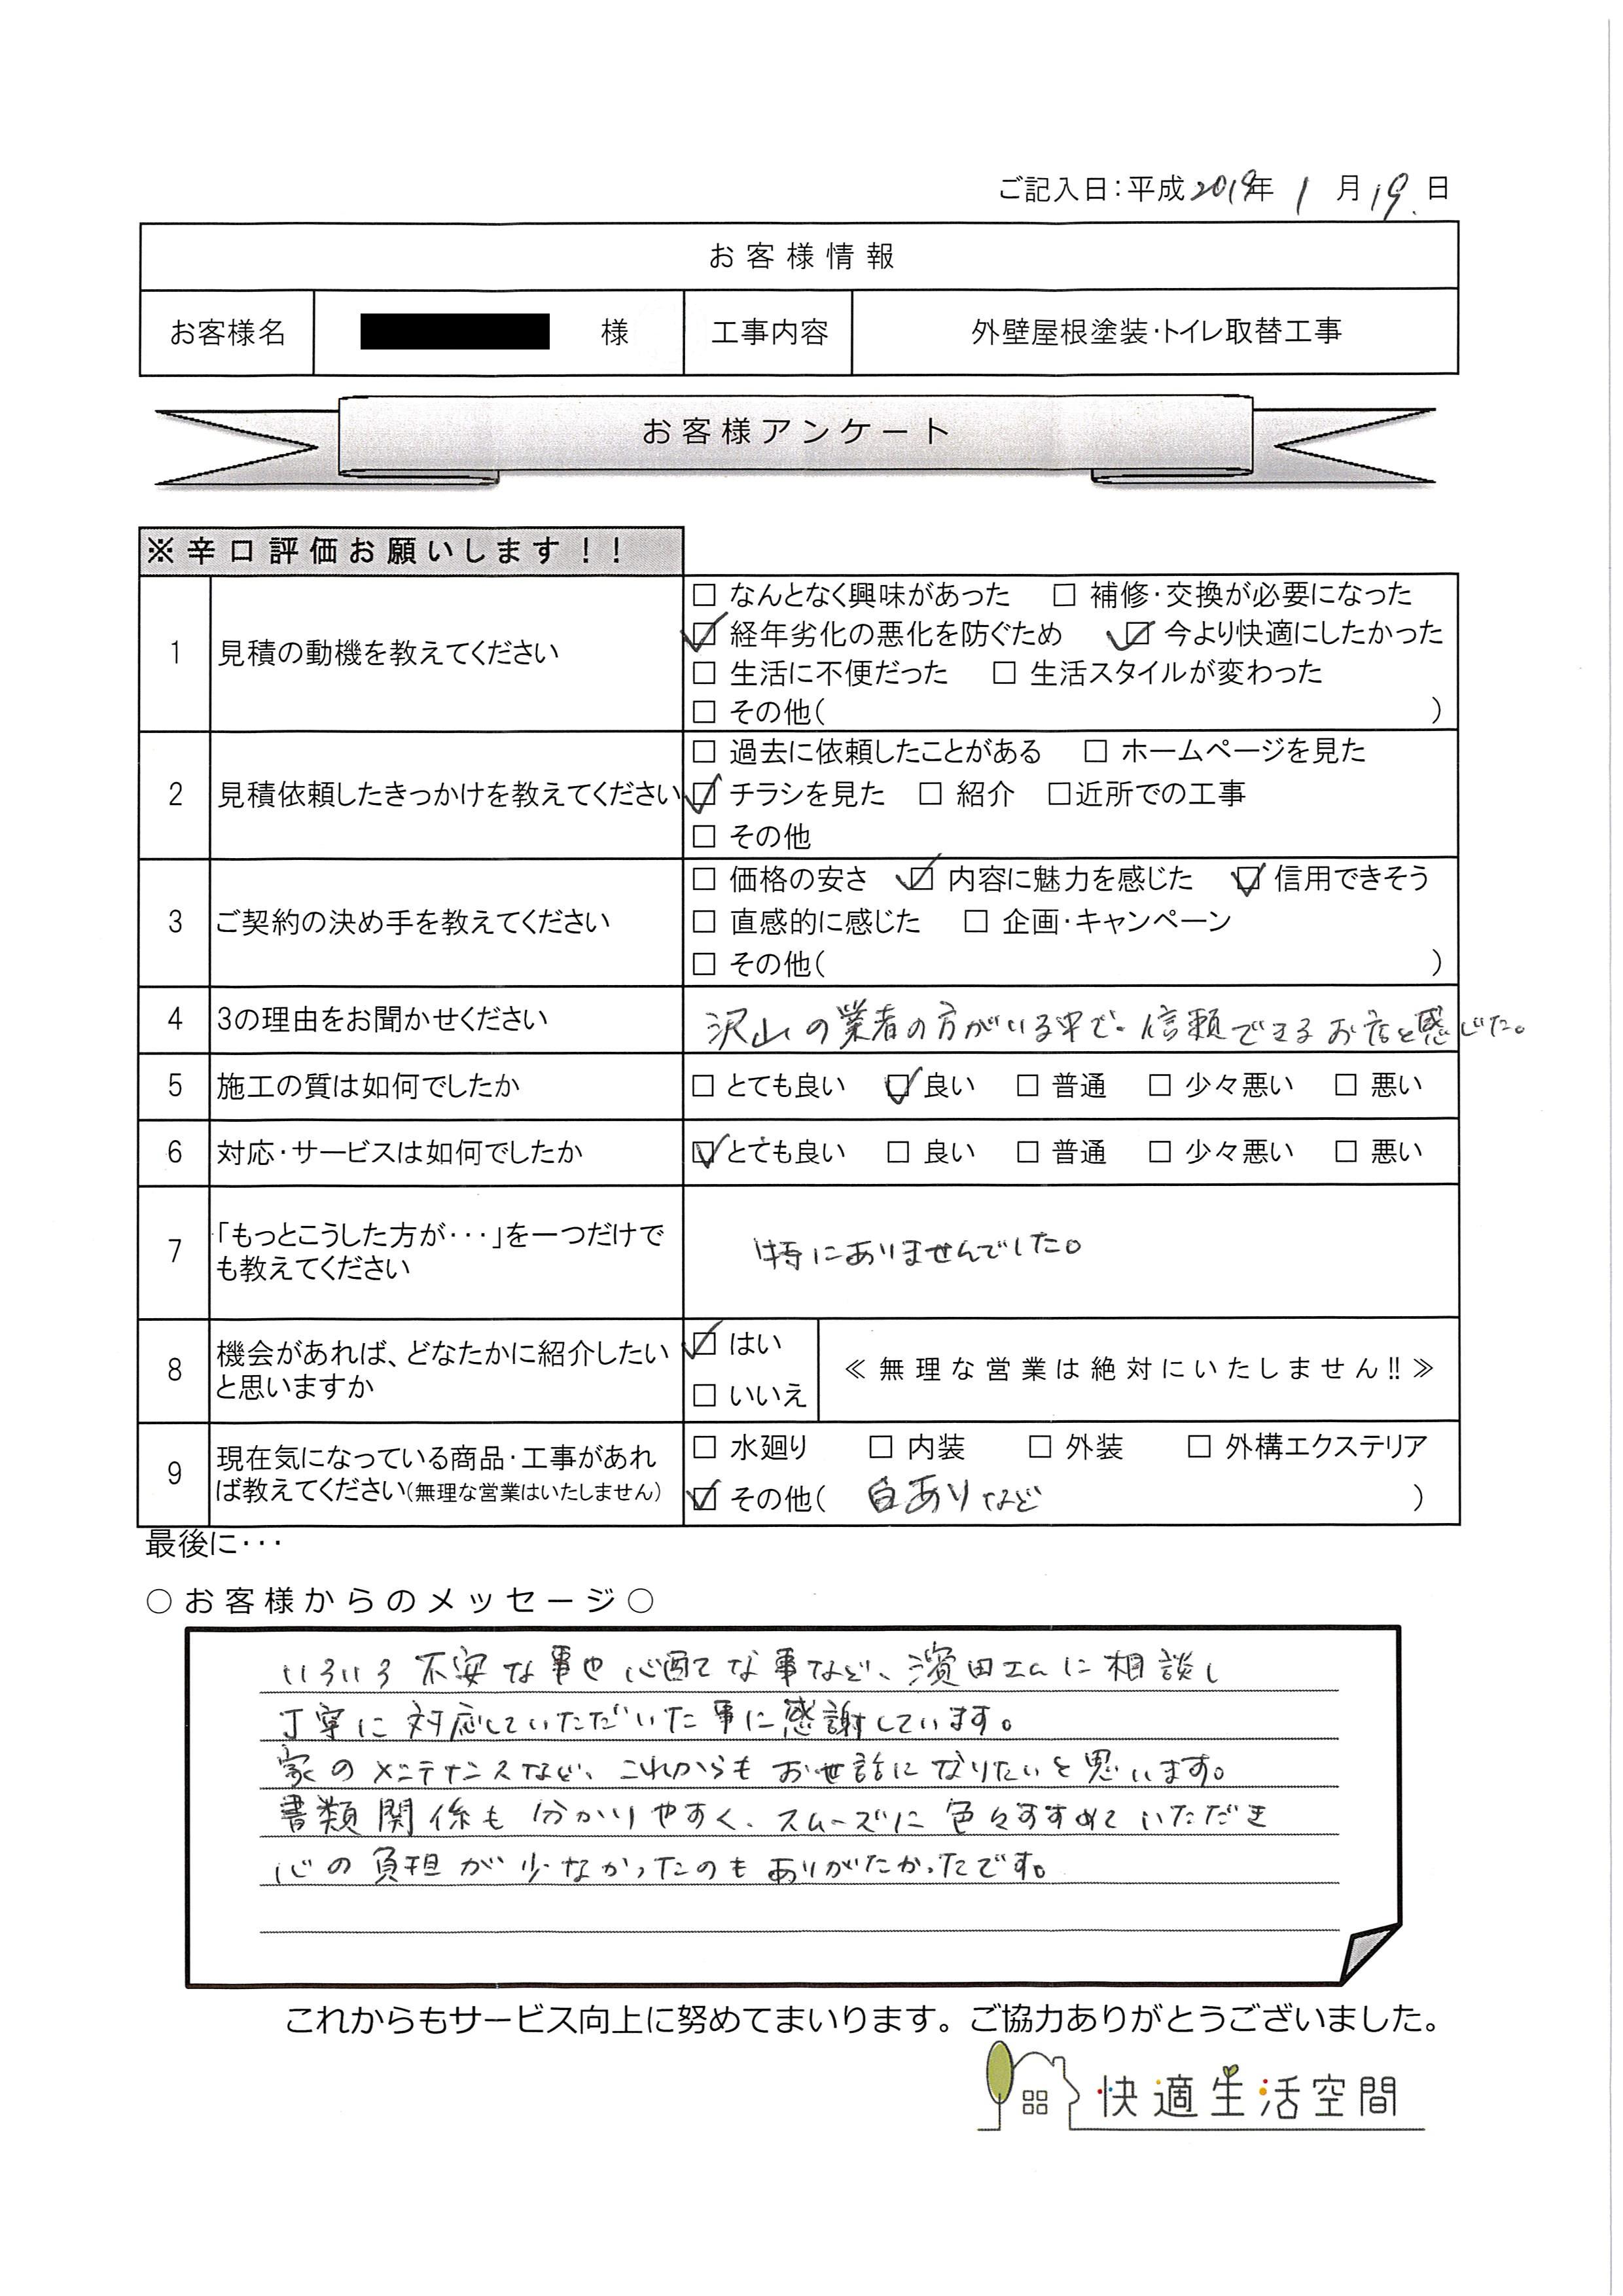 Y様邸 外壁屋根塗装・トイレ交換工事 アンケート